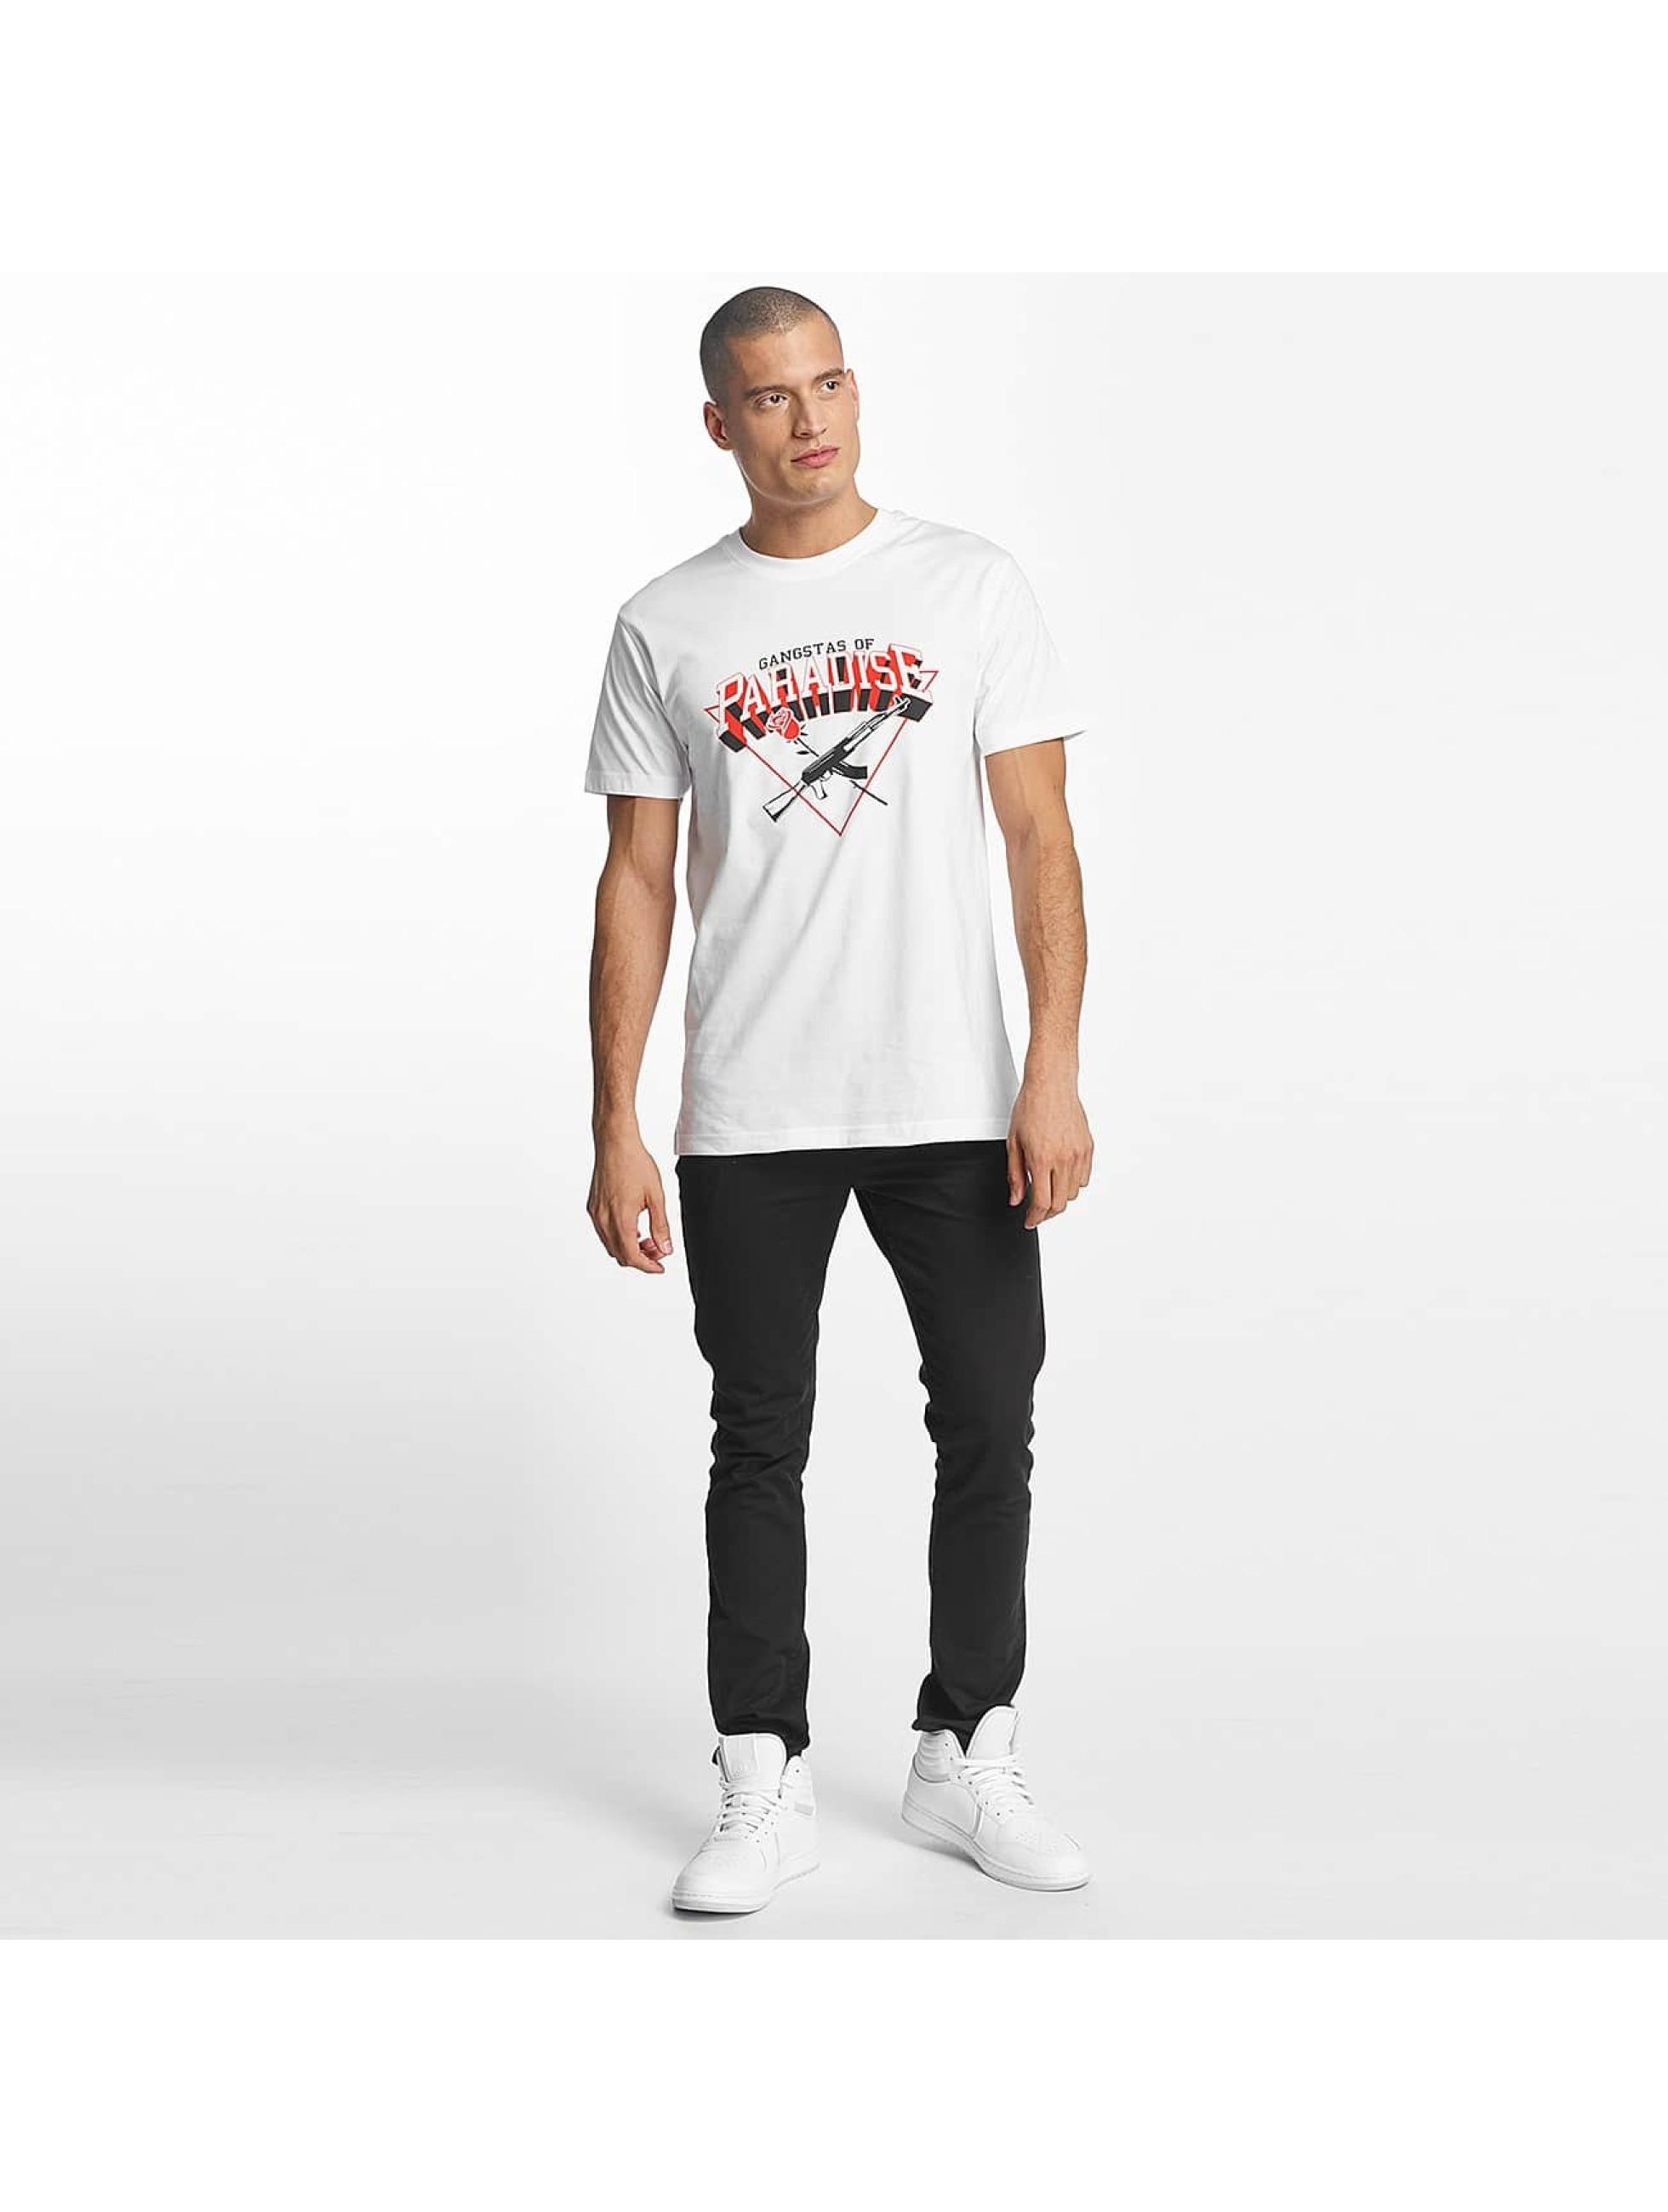 Mister Tee T-Shirt Gangstas of Paradise blanc